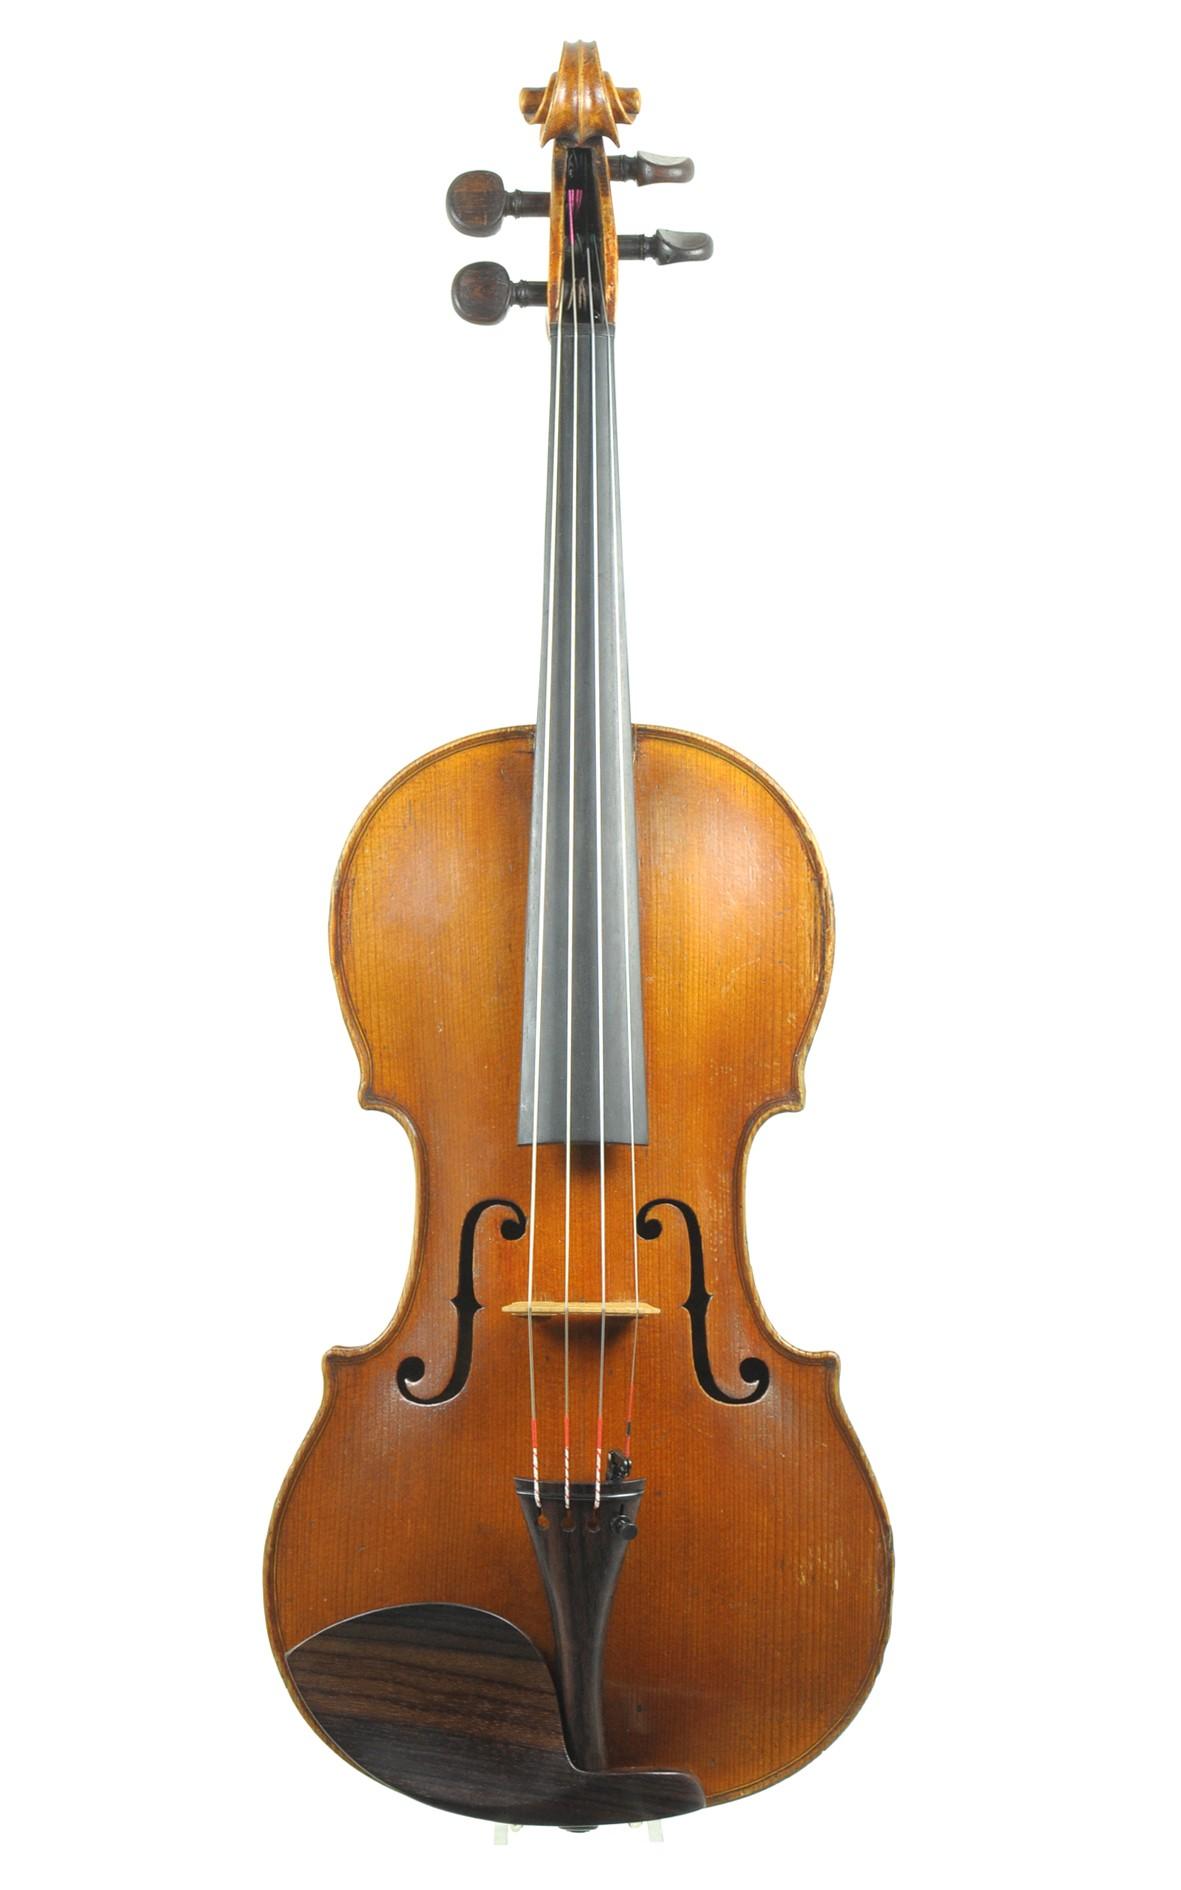 Claude-François Vuillaume, violin approx. 1780